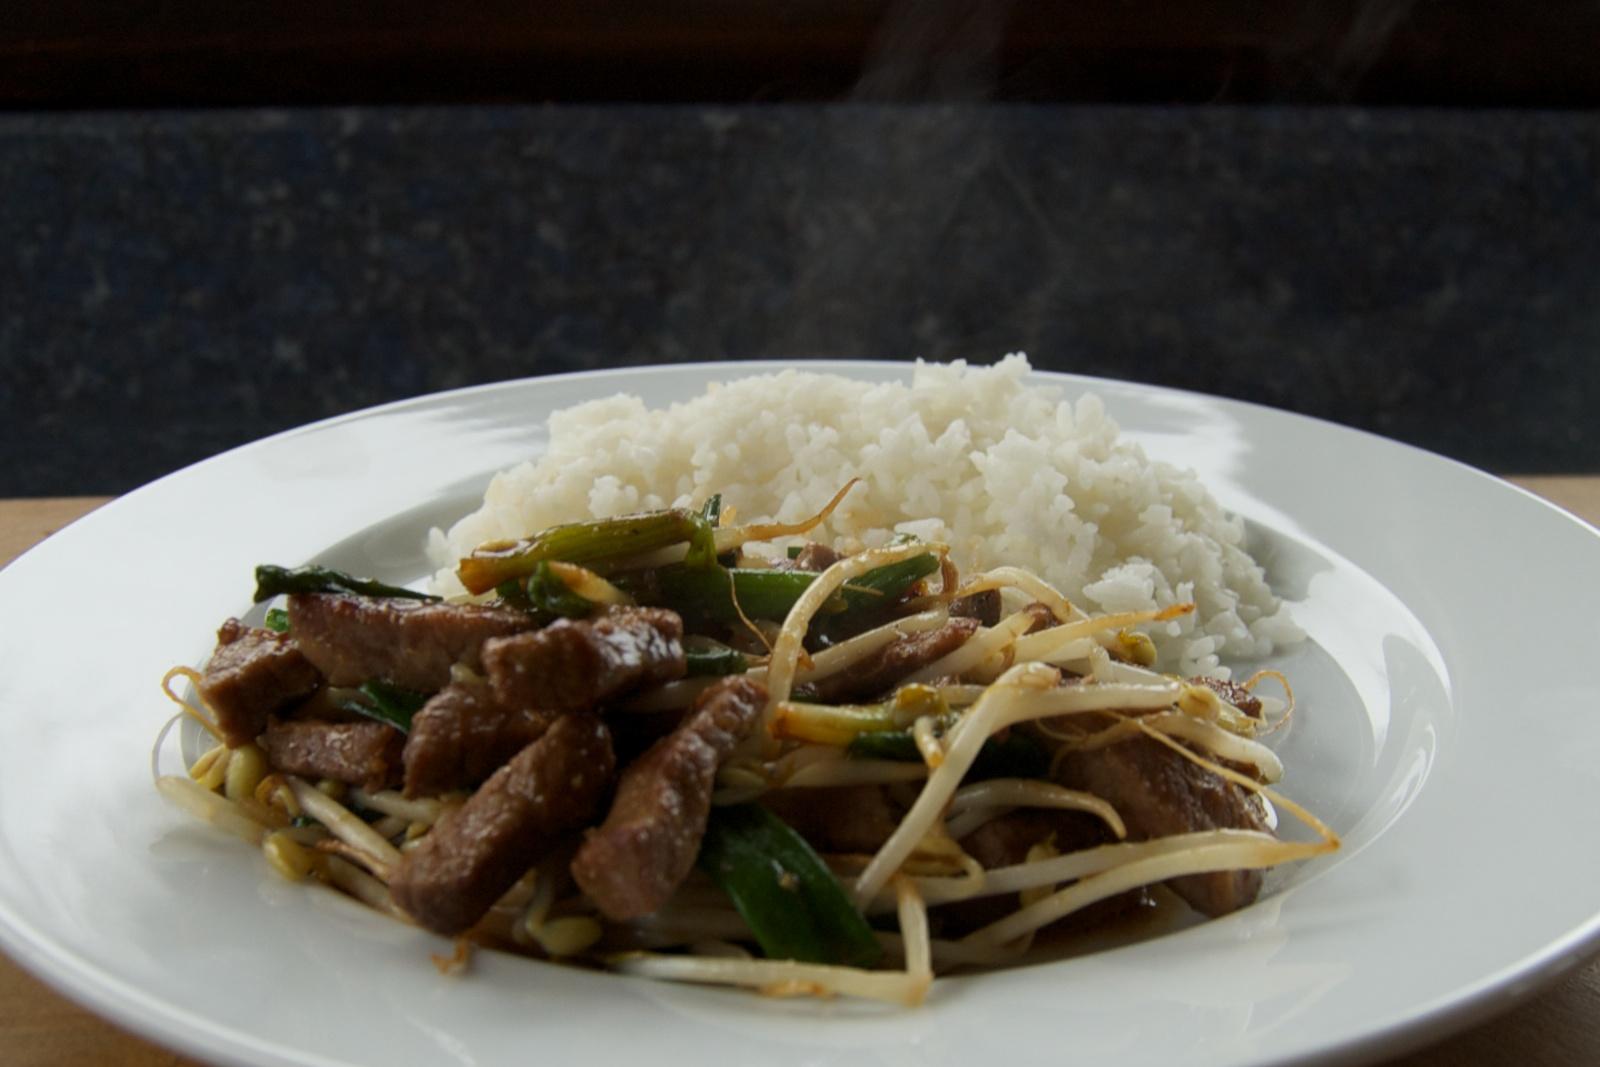 http://blog.rickk.com/food/2013/03/03/ate.2013.03.02.l.jpg